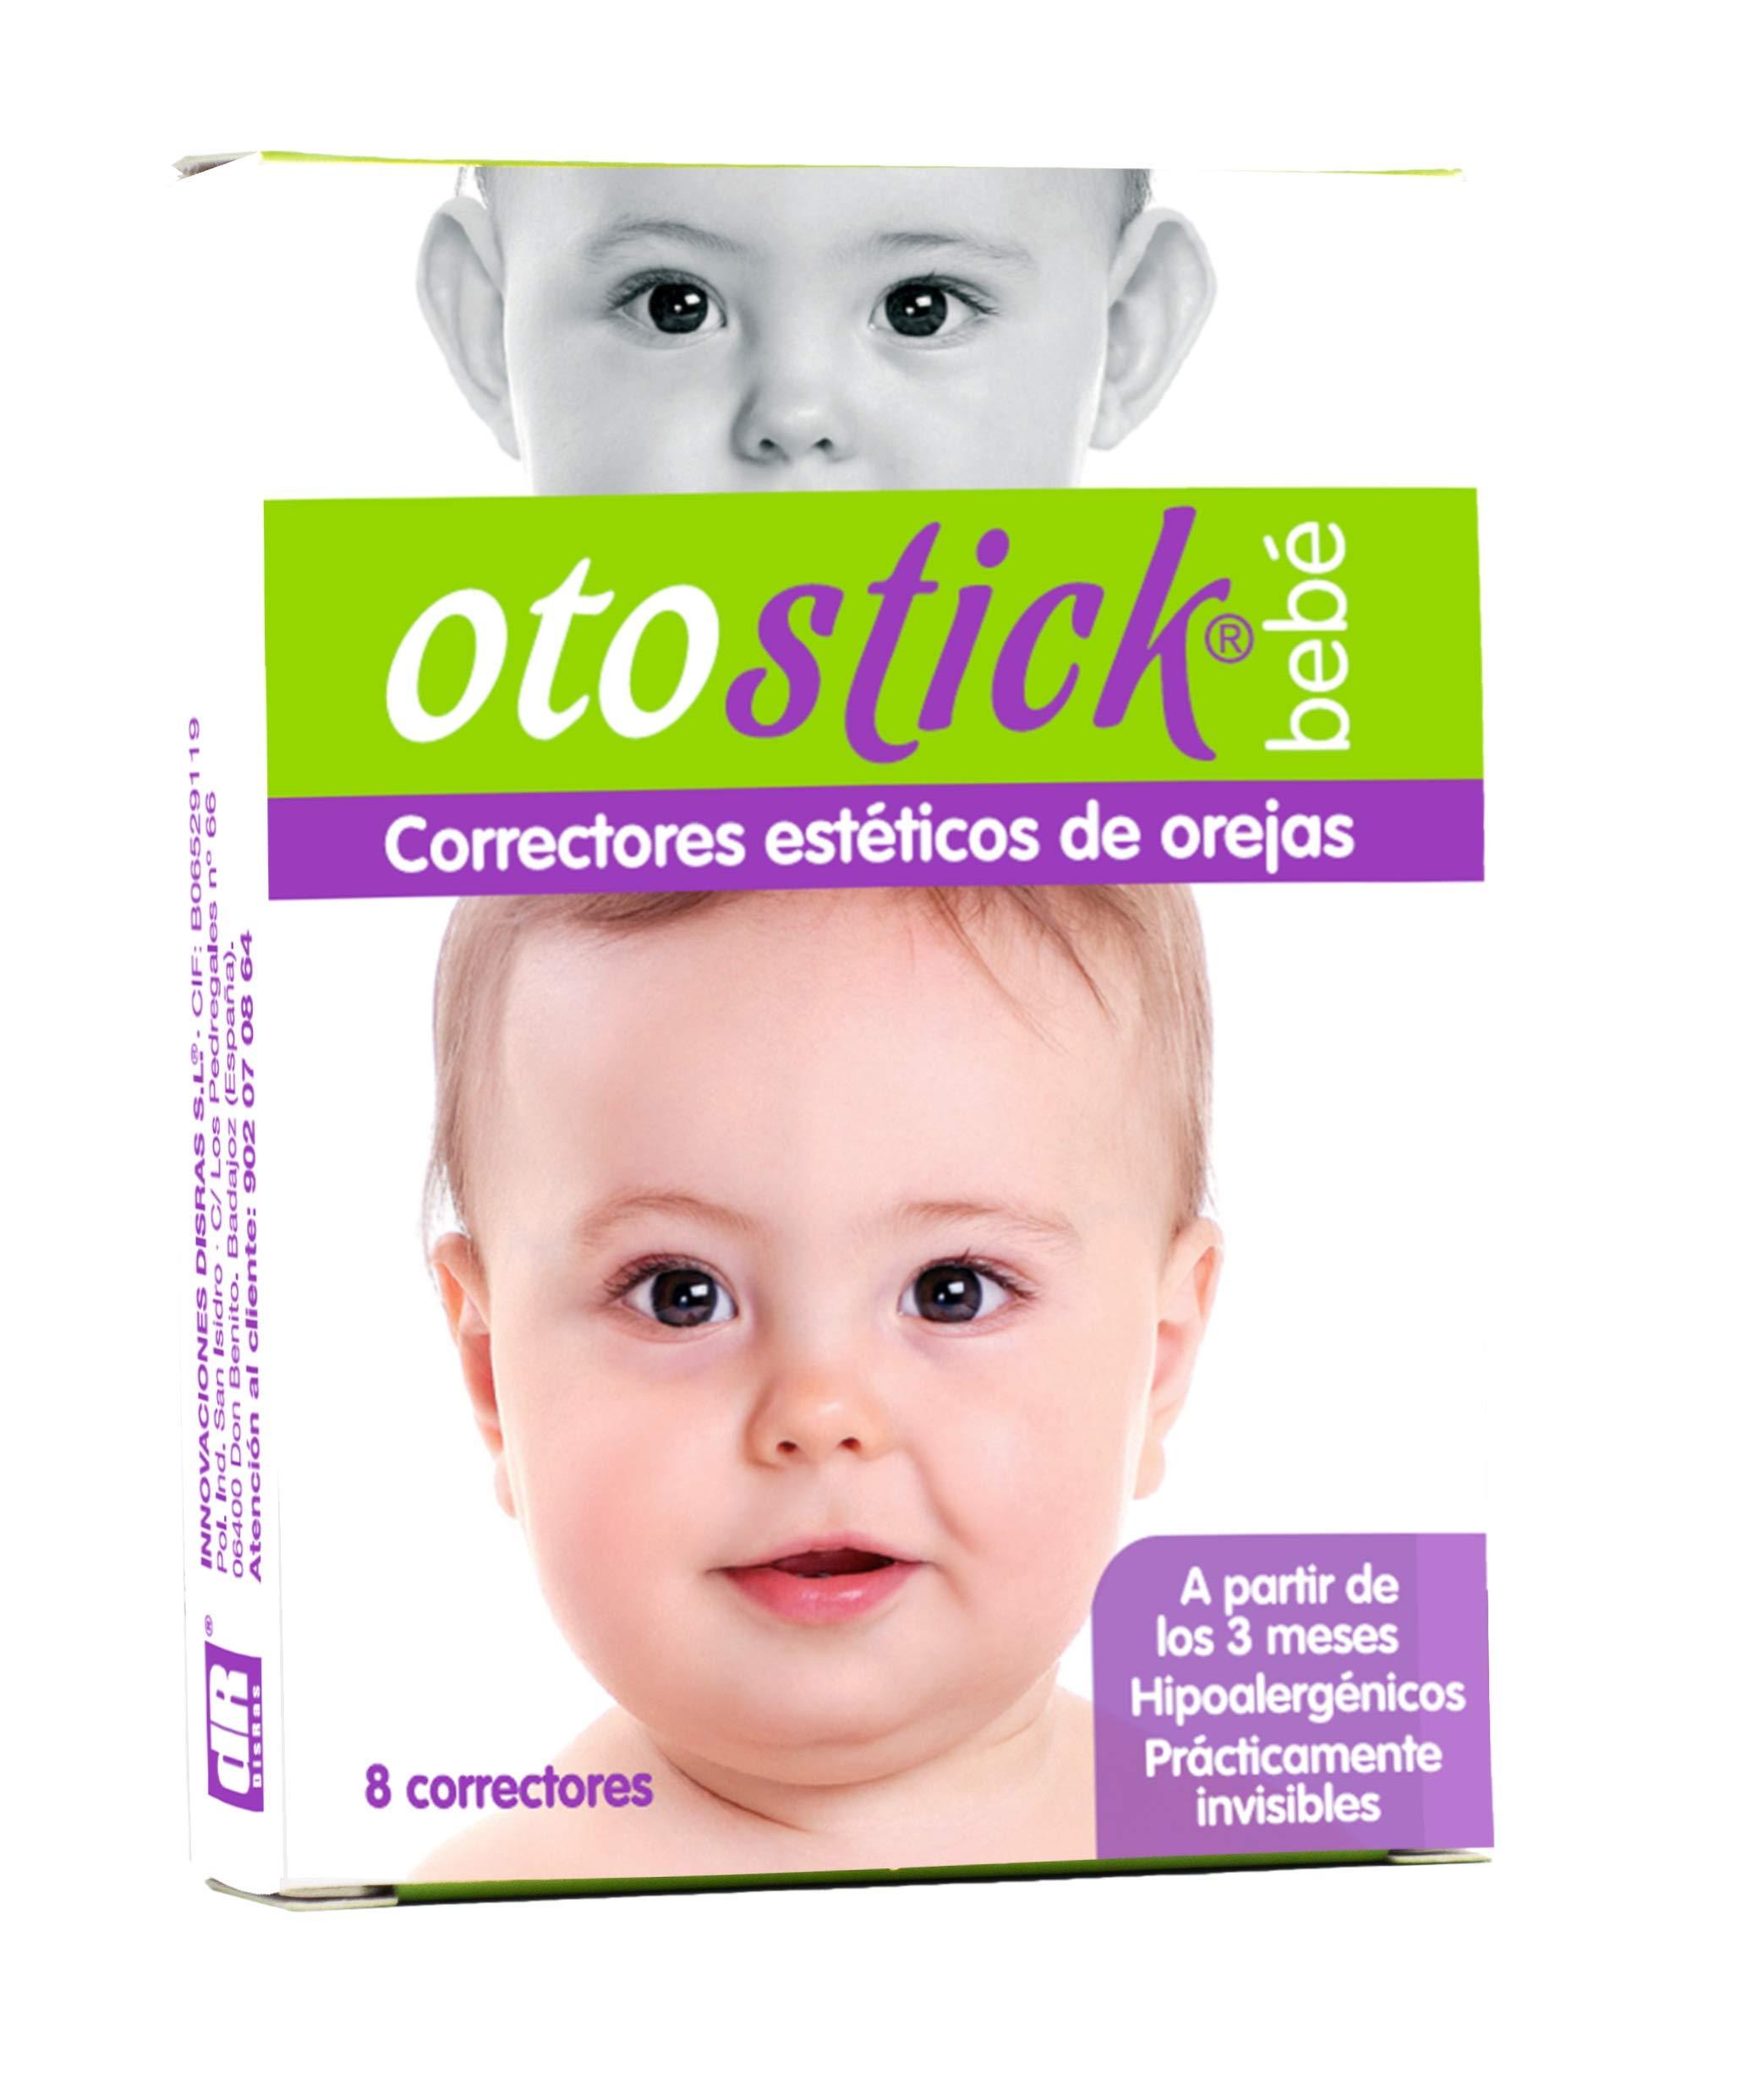 Otostick Corrector Estético de Orejas para Bebés – 38 gr